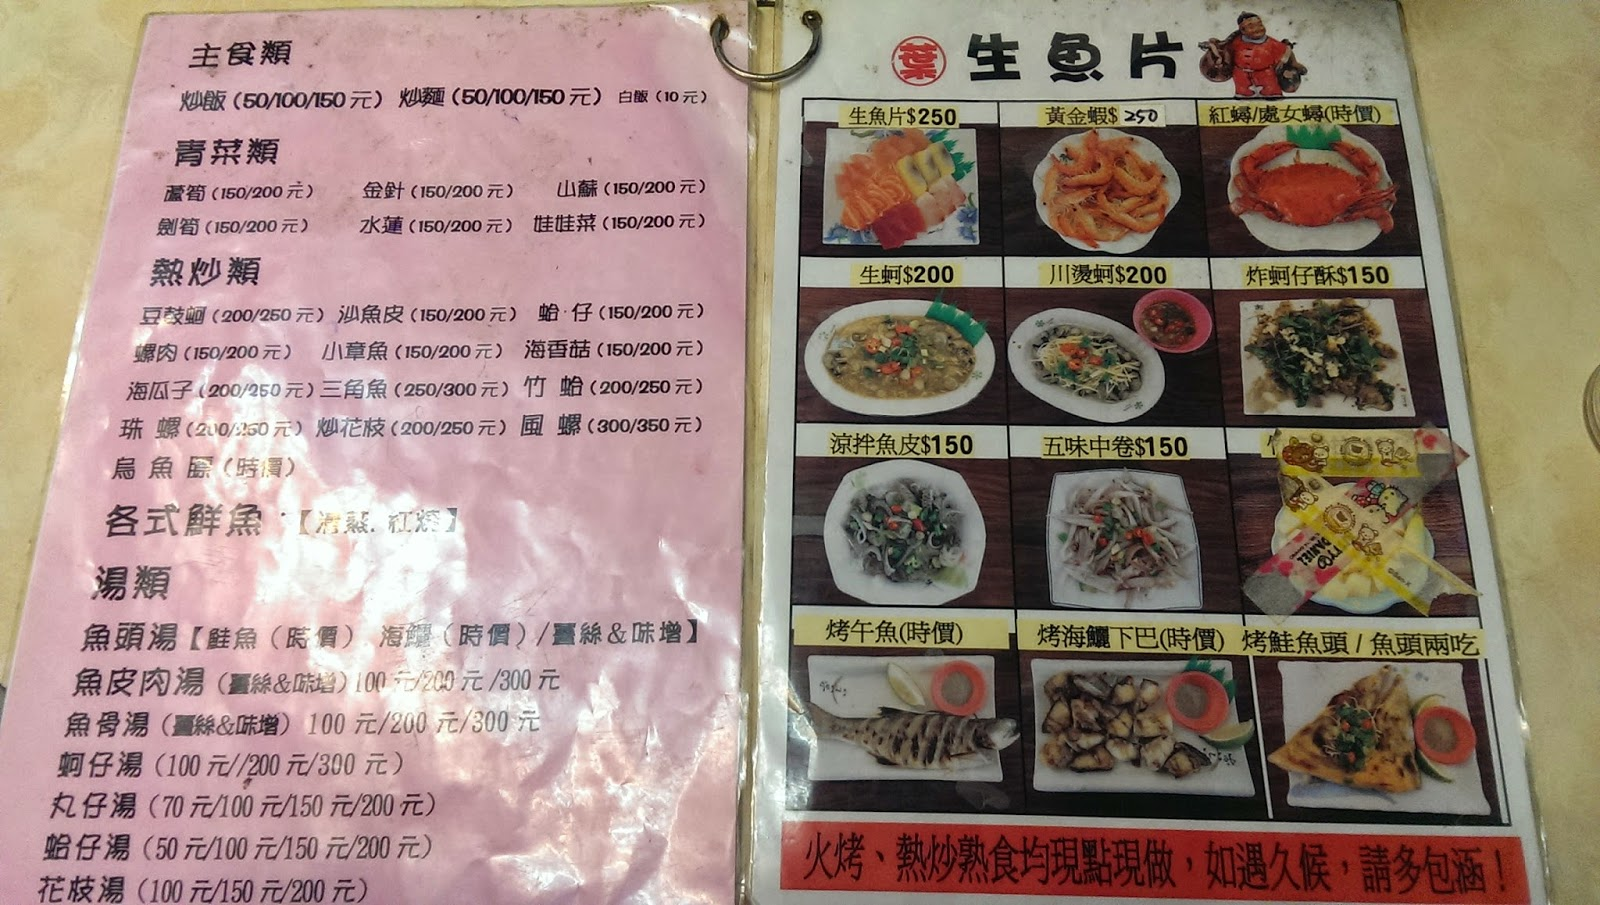 2015 02 02%2B12.04.48 - [食記] 葉家生魚片 - 布袋觀光漁市中的鮮魚餐廳